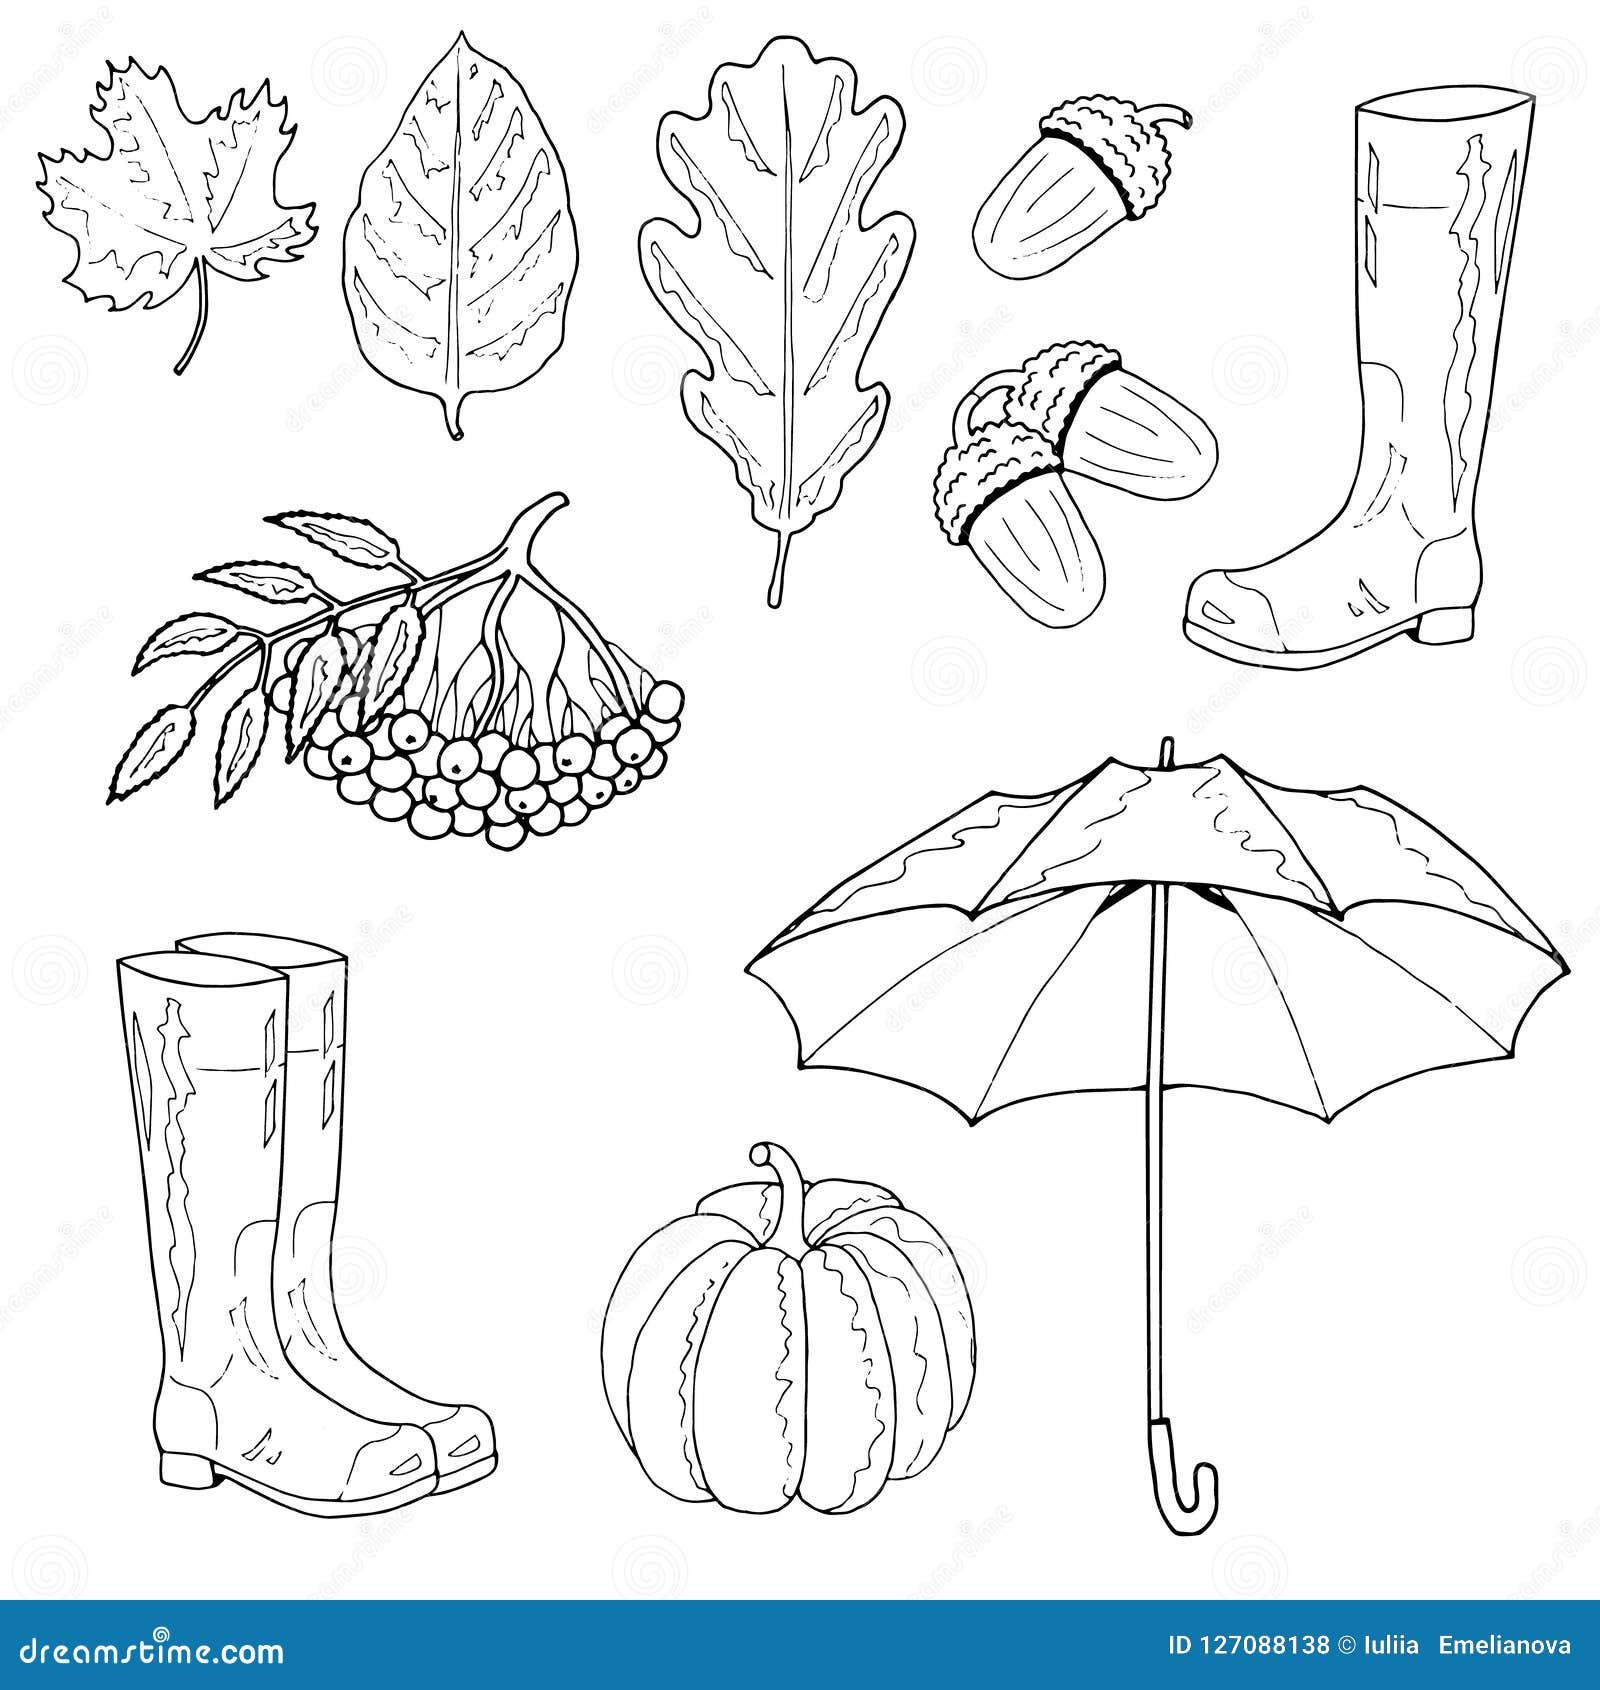 eichenblatt stock illustrationen vektors  klipart